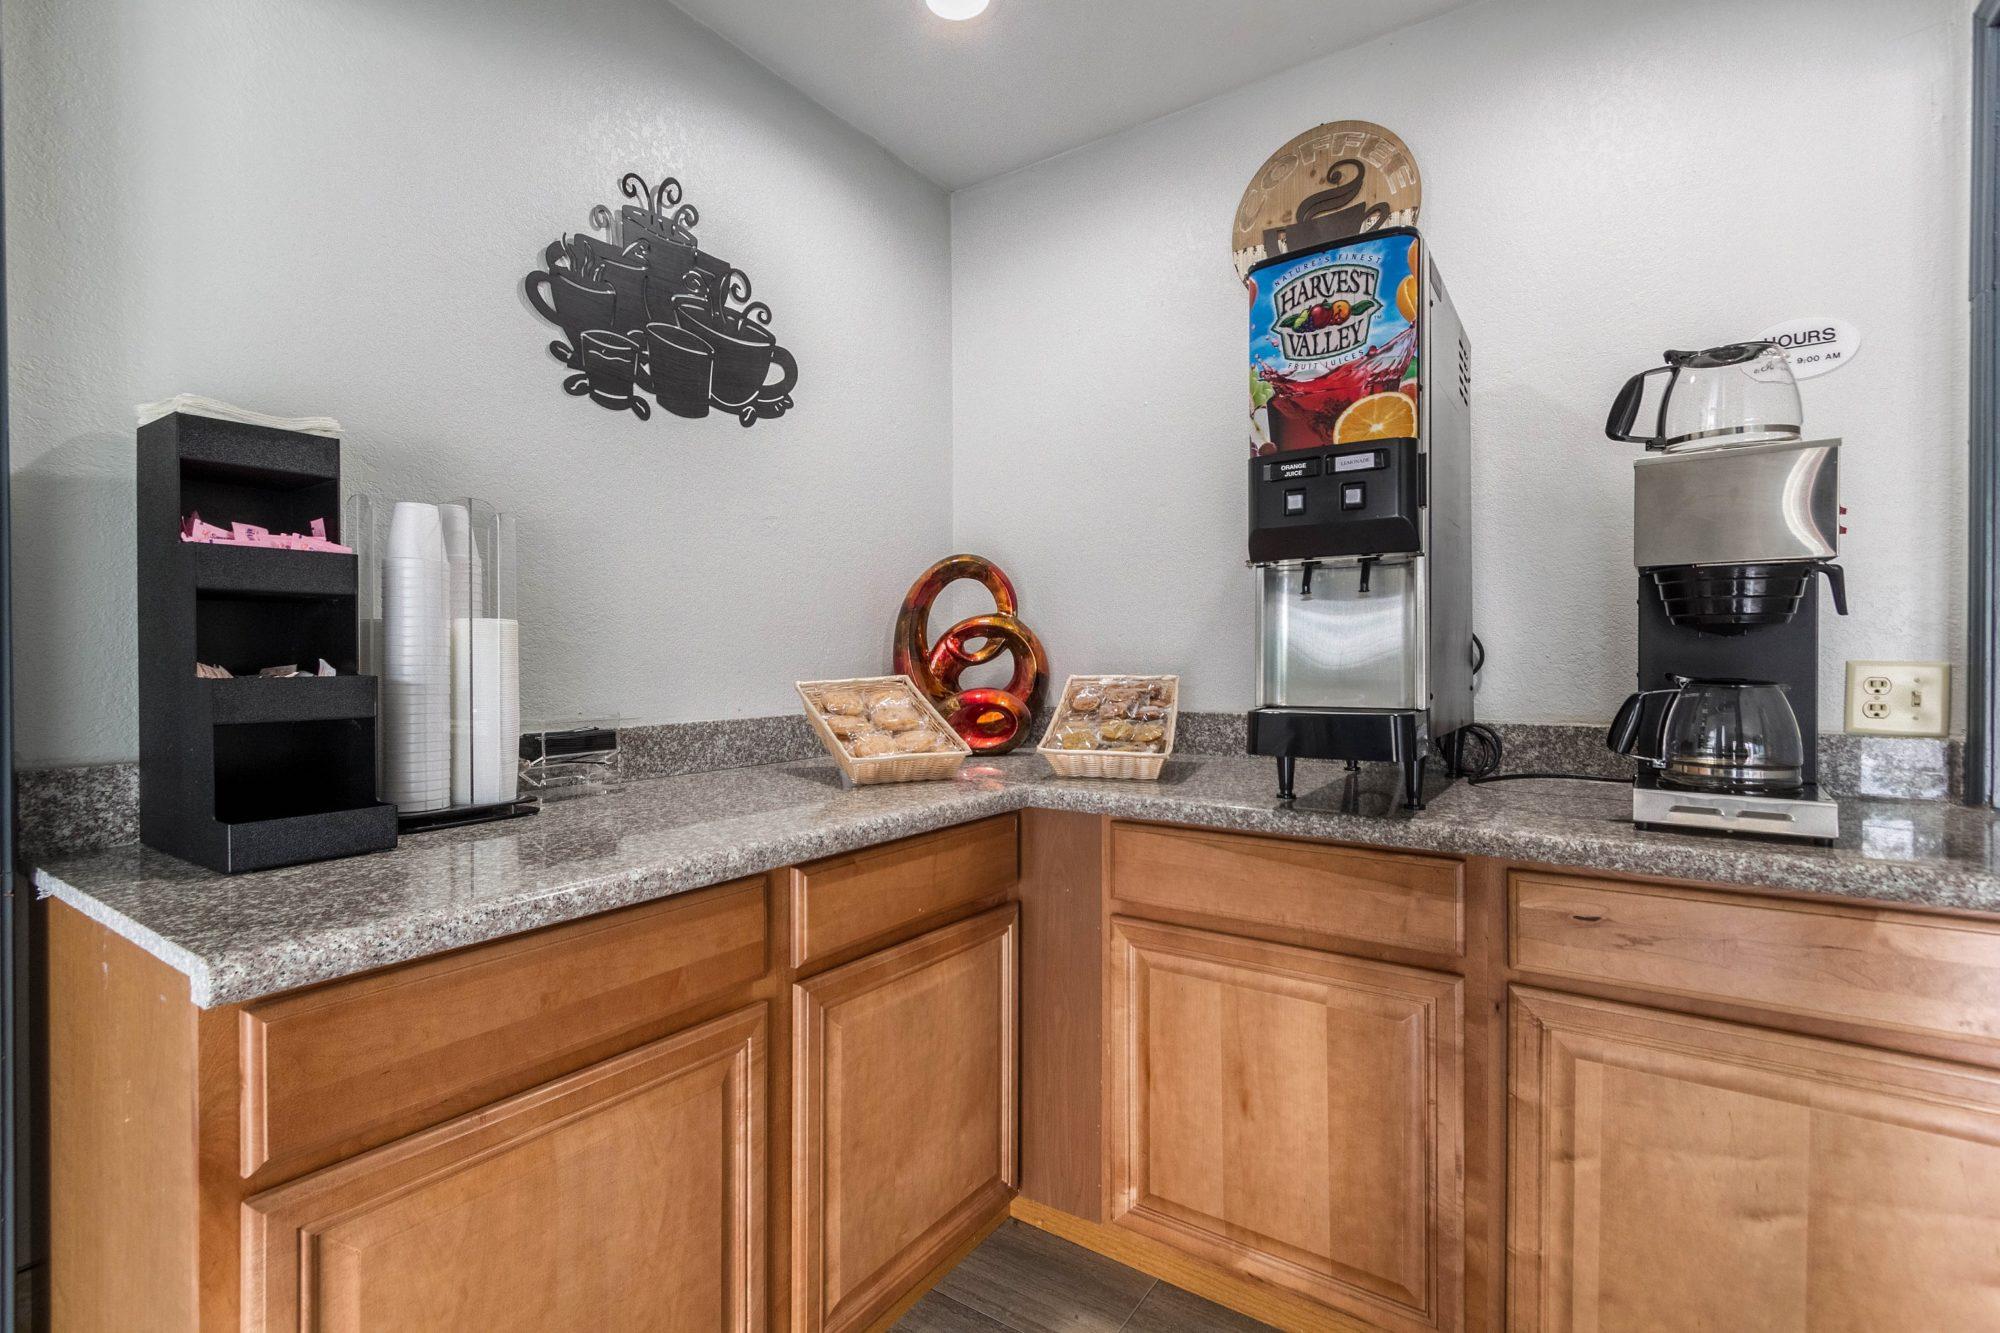 Breakfast display counter wityh juice machine, coffee machine, baskets with breakfast pastries